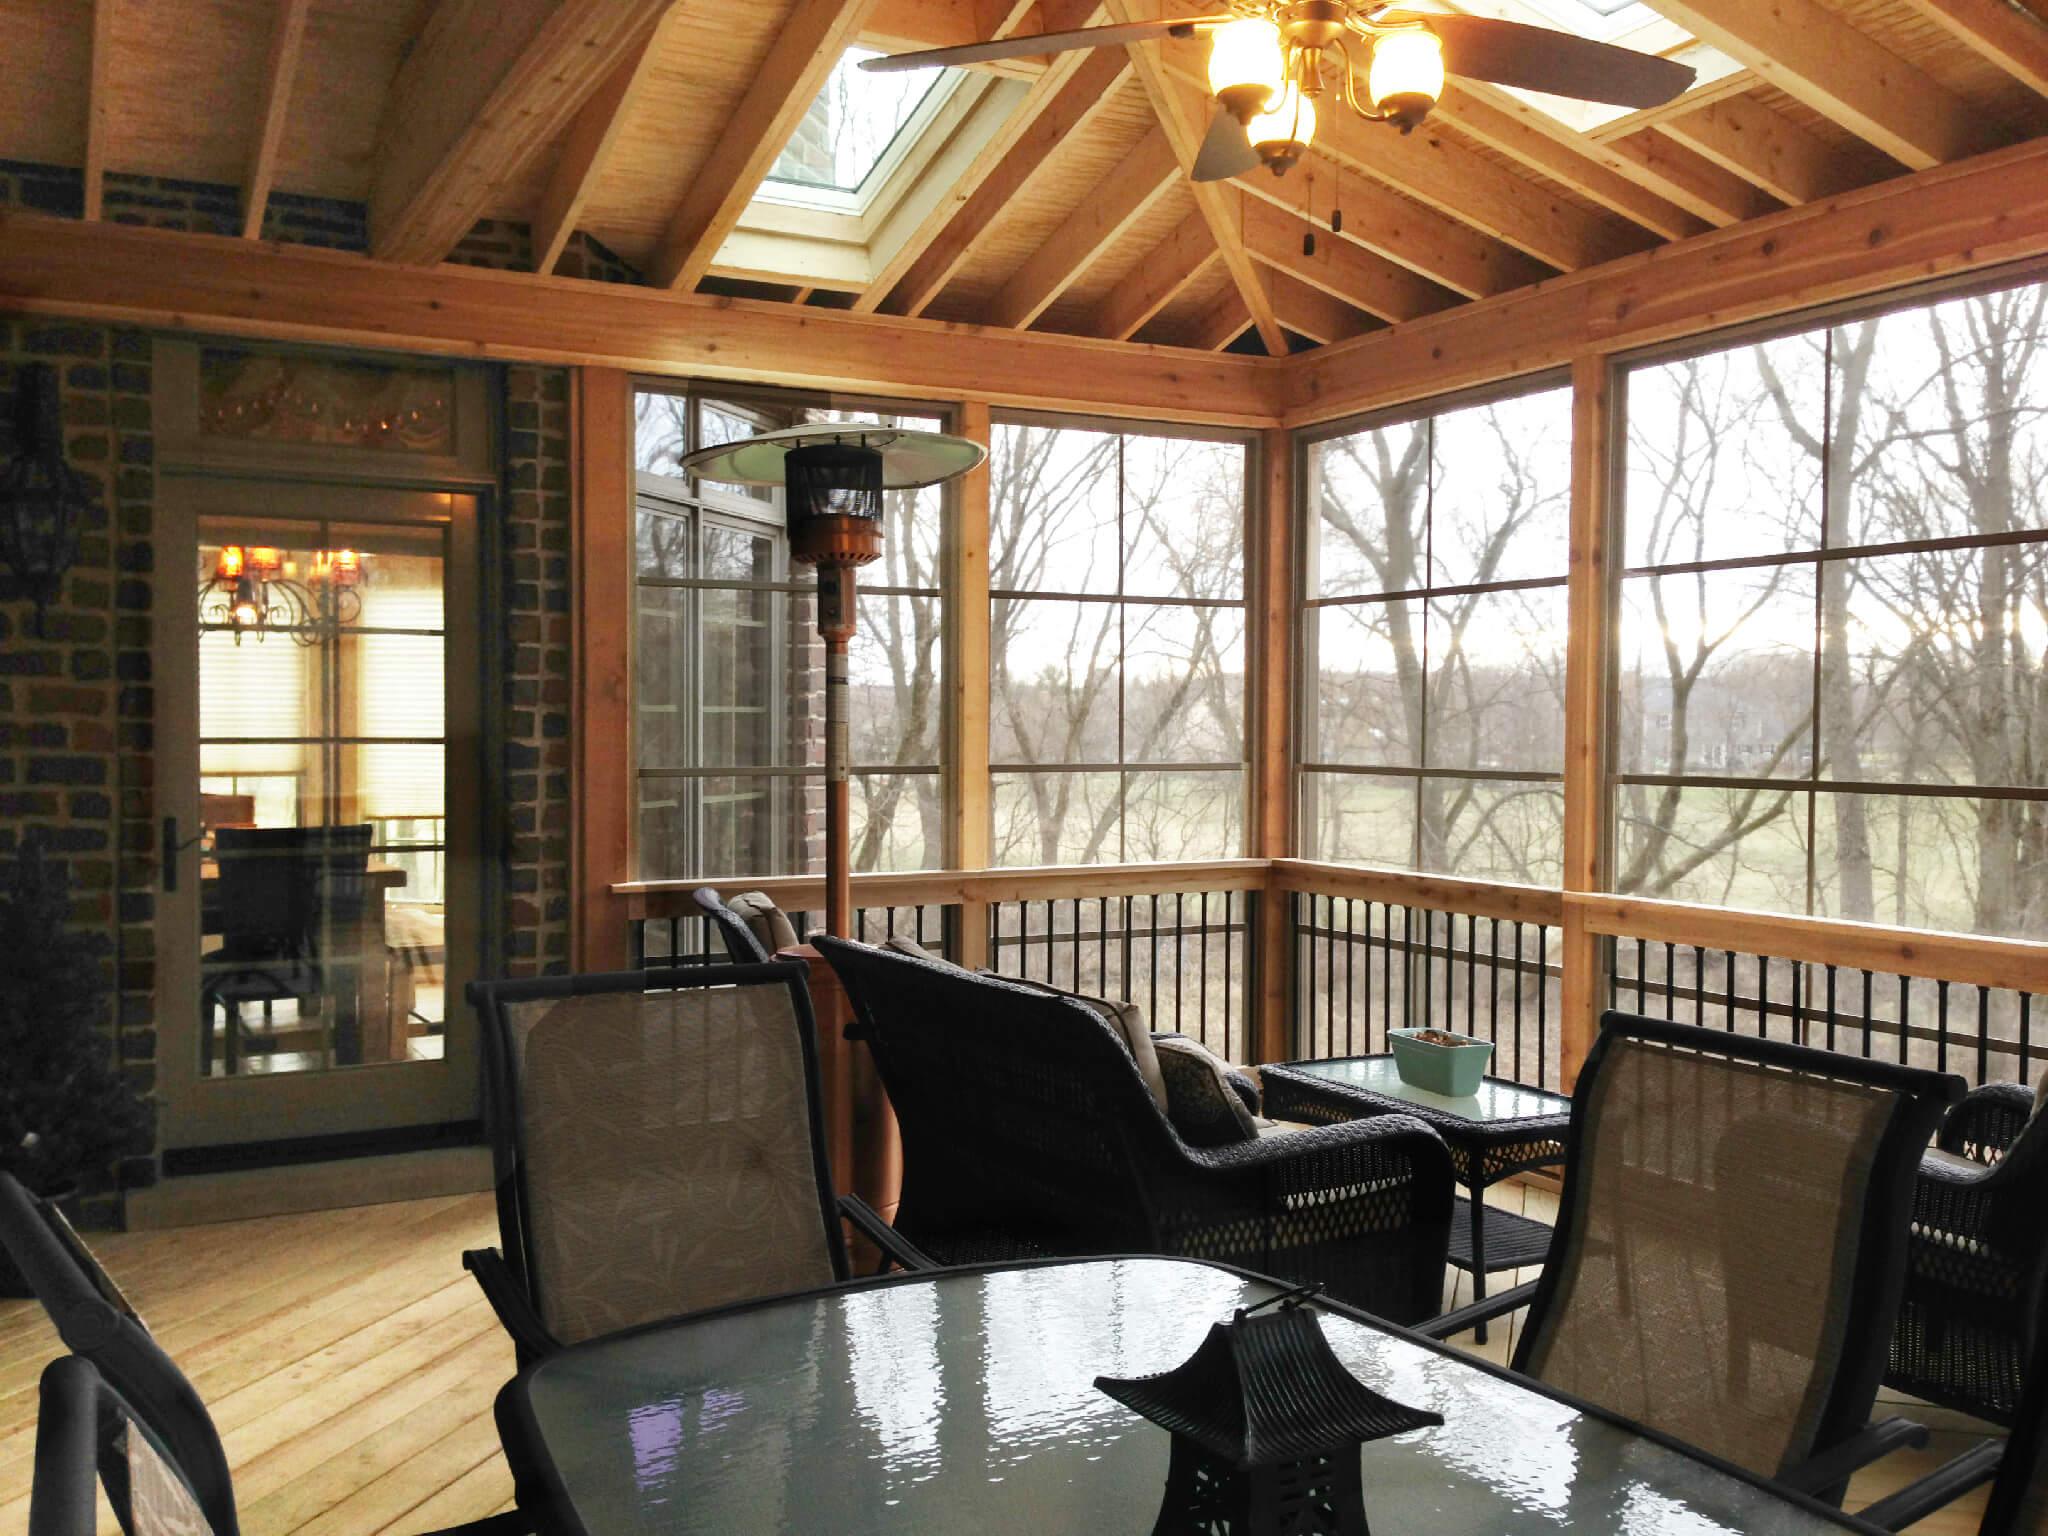 Custom screen porch with skylights